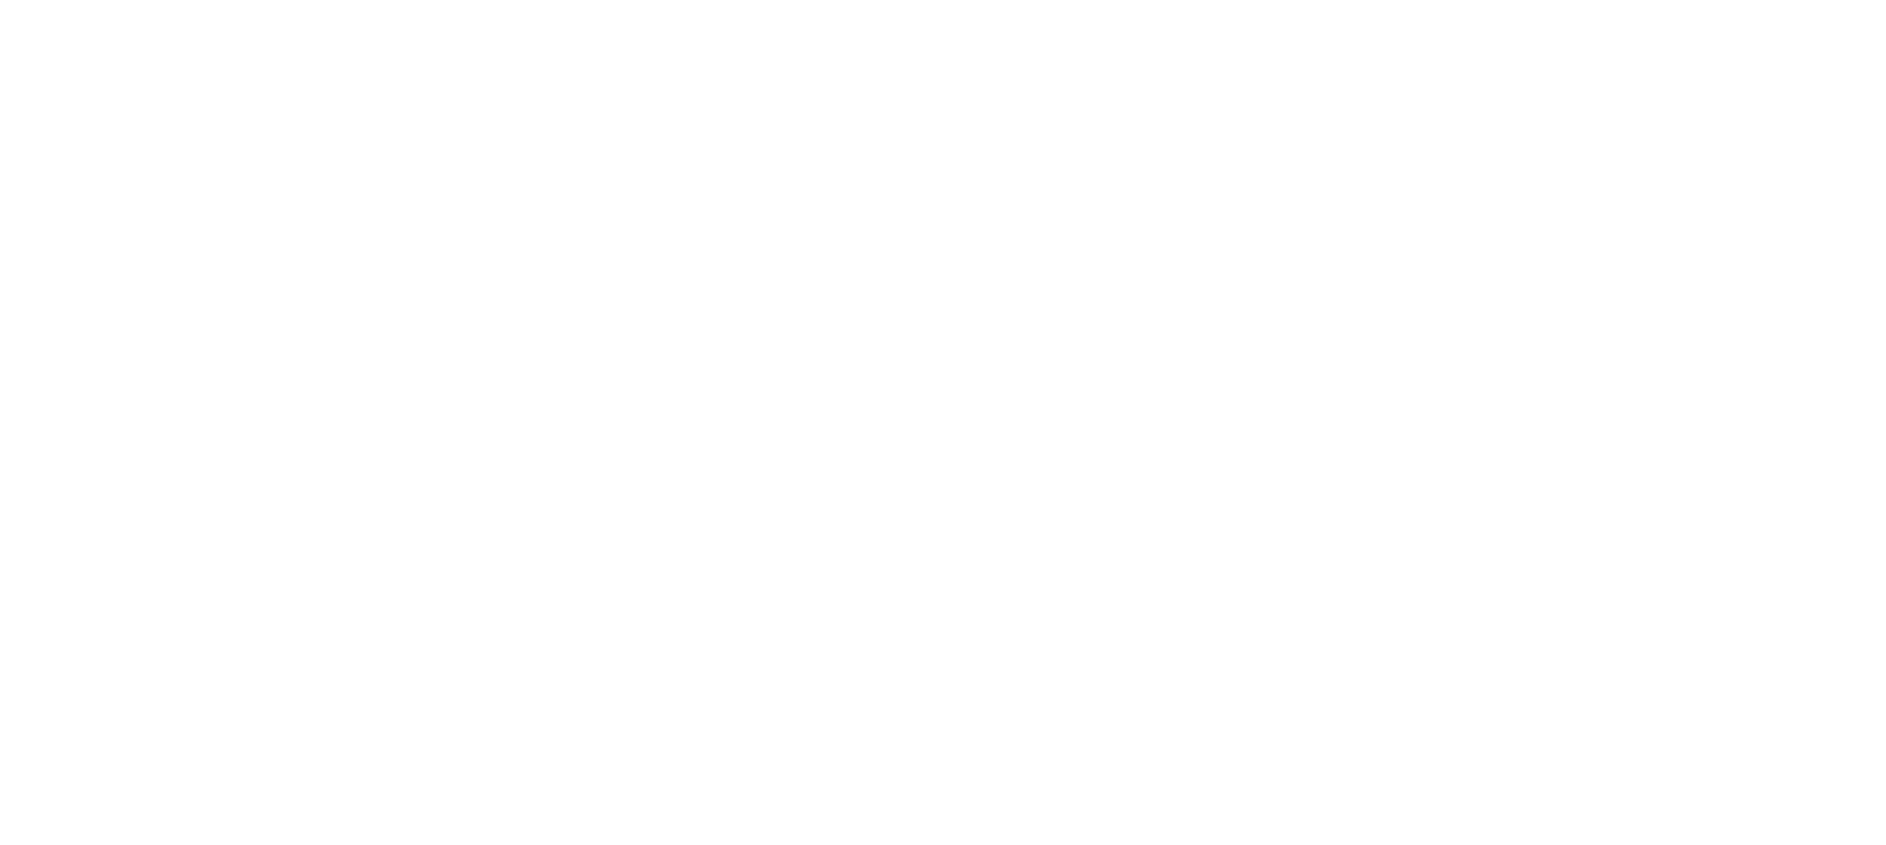 FD KVOM